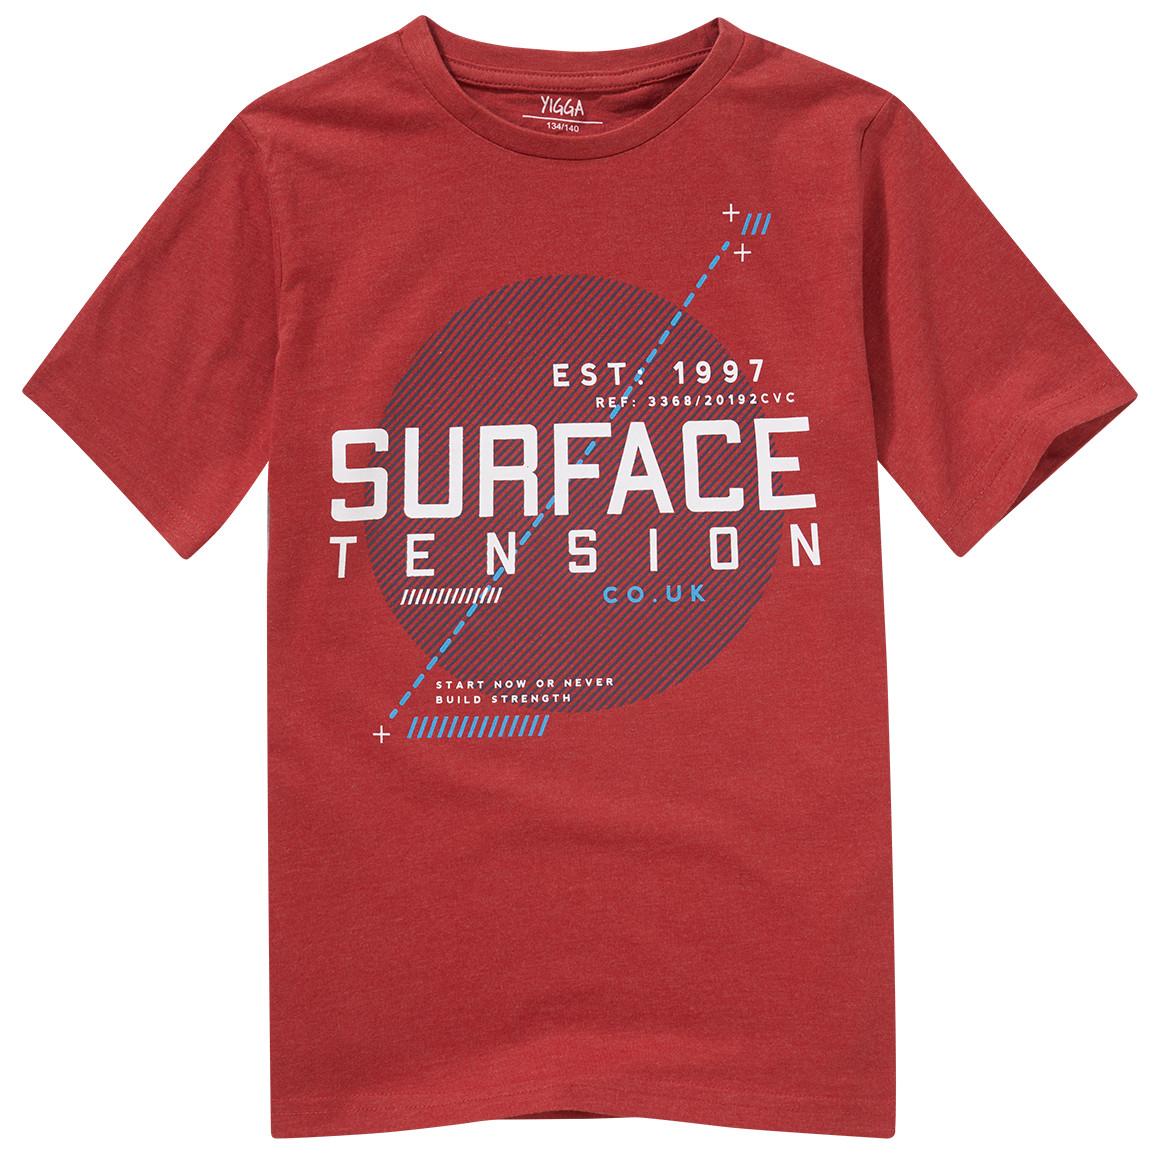 Boysoberteile - Jungen T-Shirt mit Print - Onlineshop Ernstings family